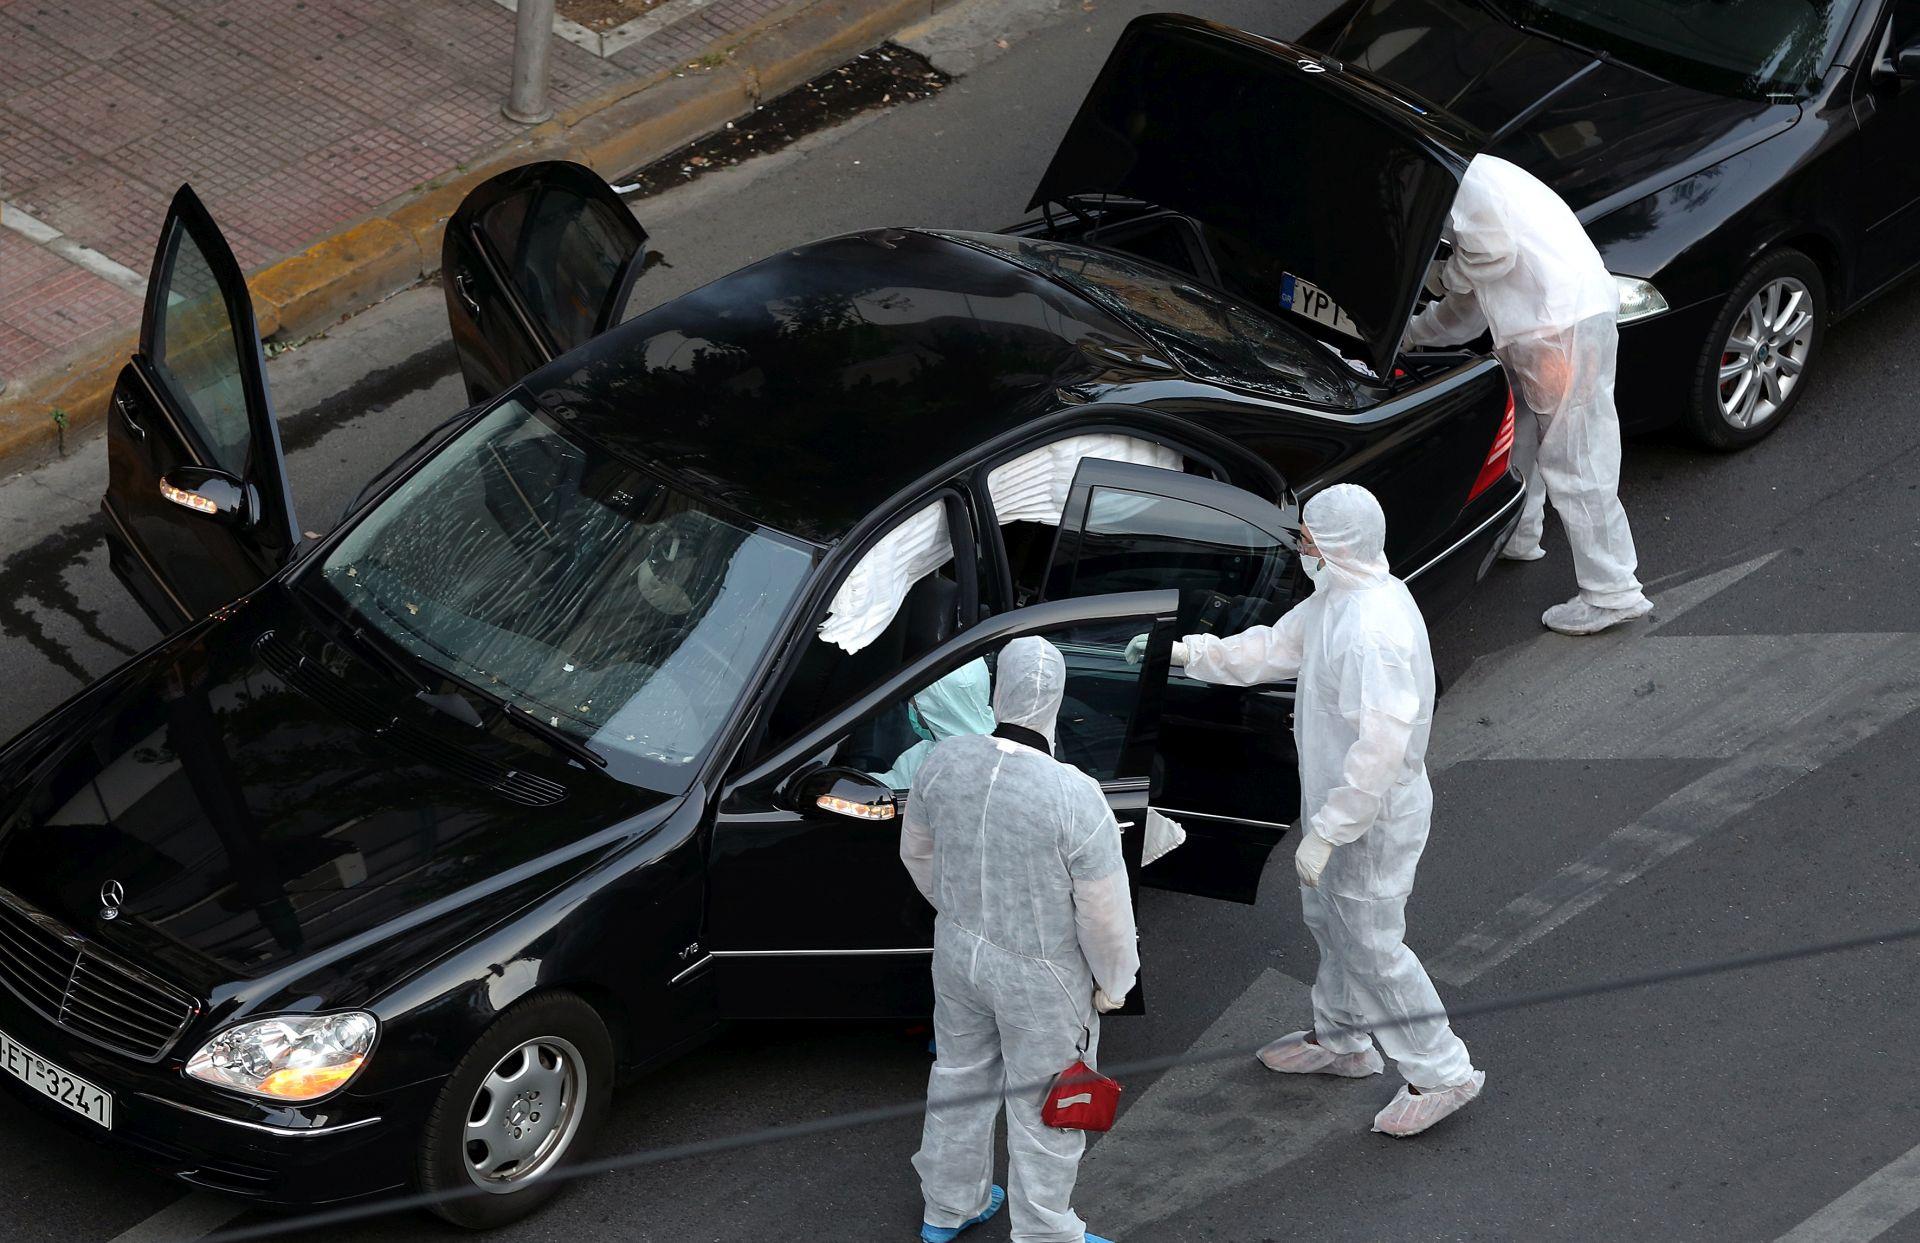 Bivši grčki premijer oporavlja se od napada pismom bombom